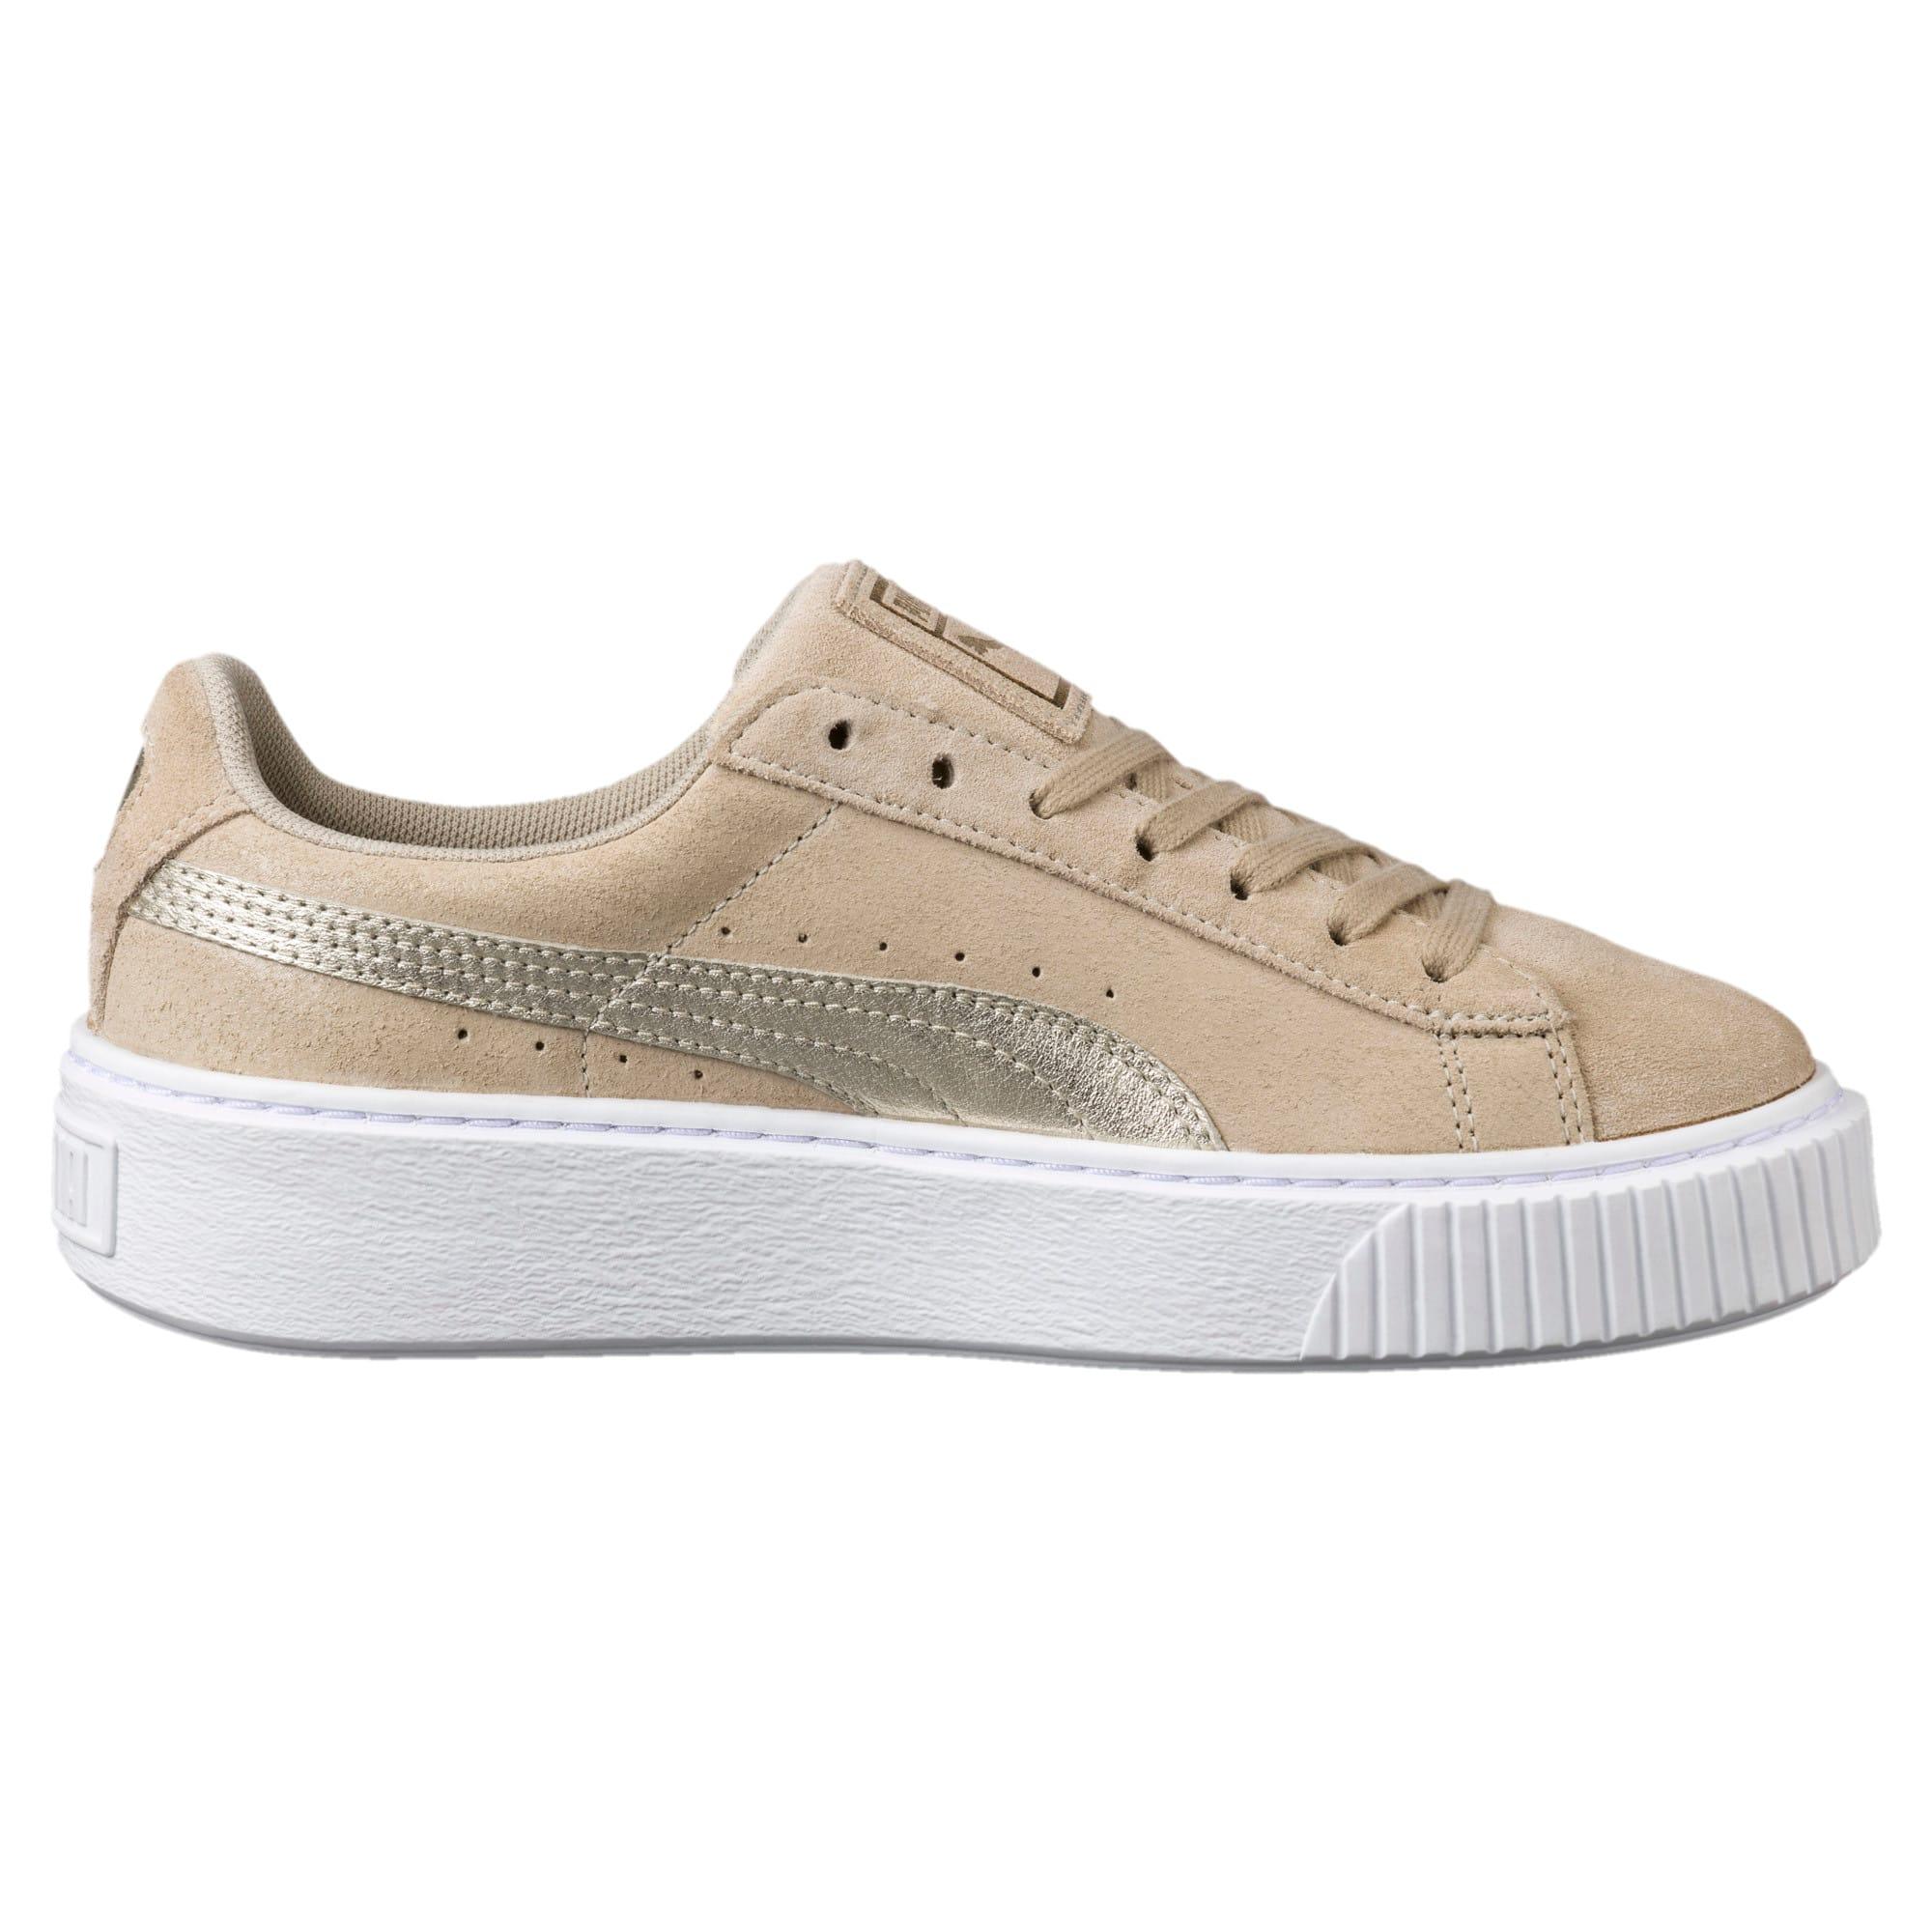 promo code 50e09 8cbe8 Suede Platform Metallic Safari Women's Sneakers